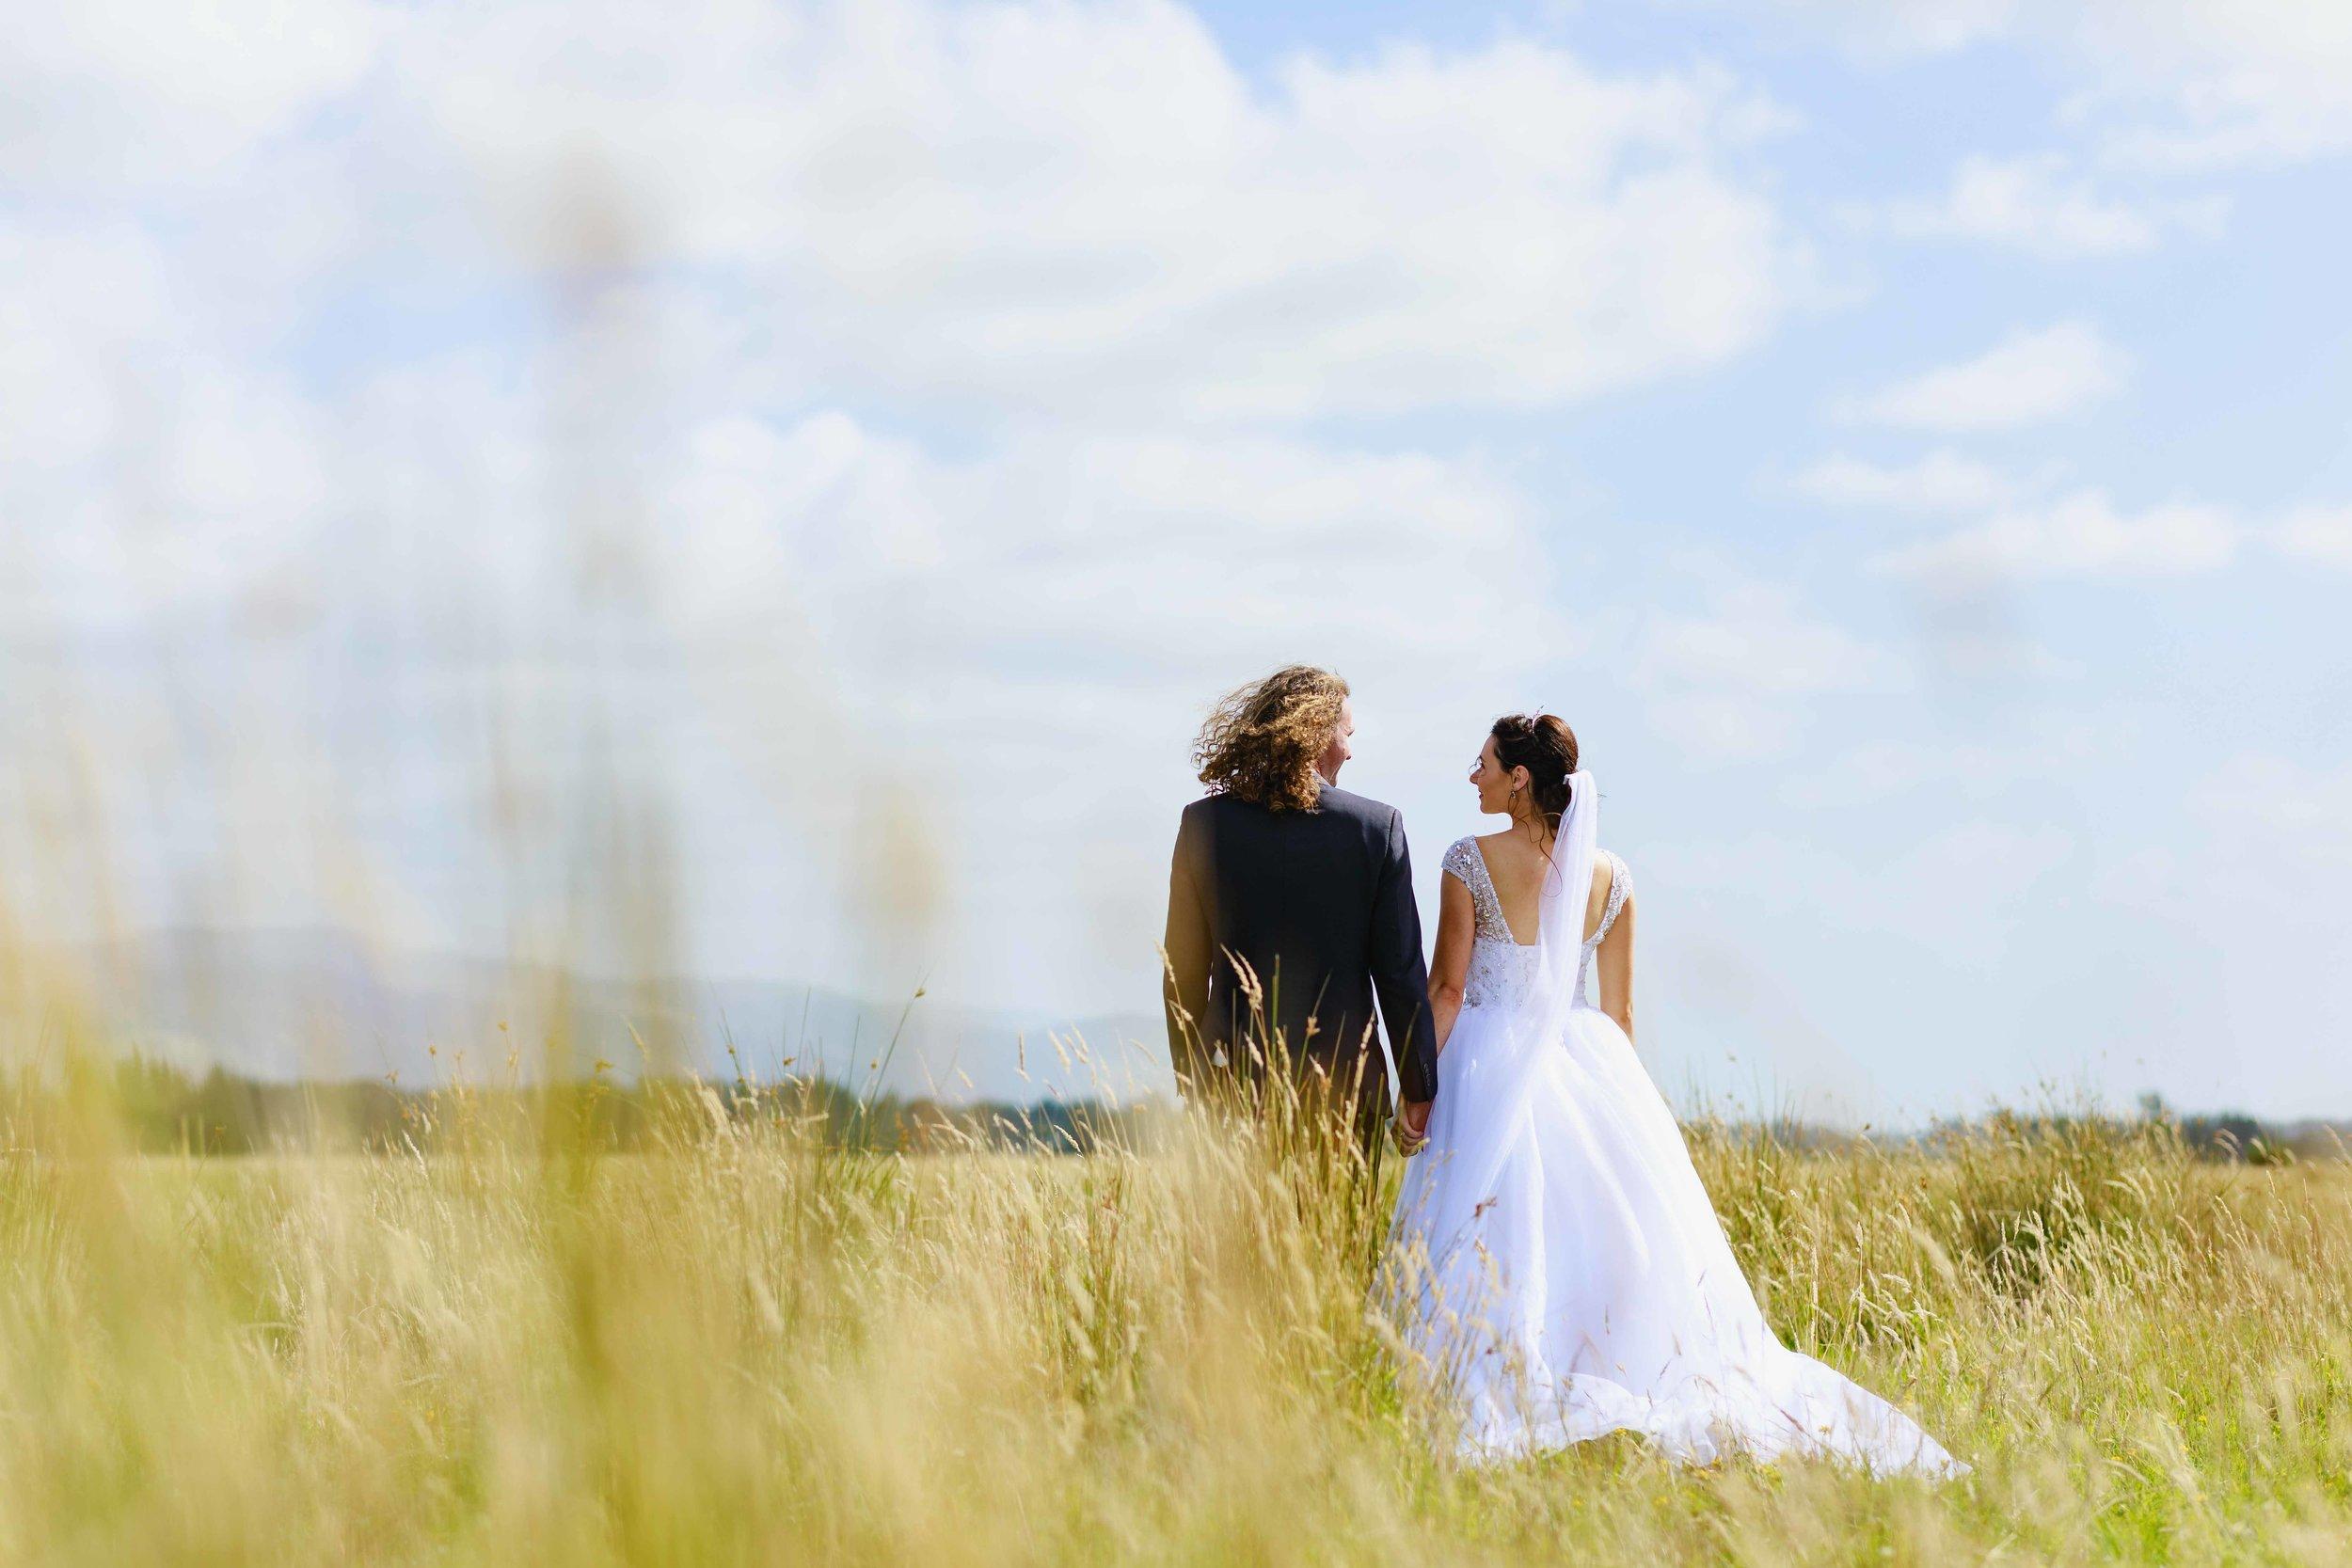 the-chalet-highlight-wedding-photography-palmerston-north-134.jpg